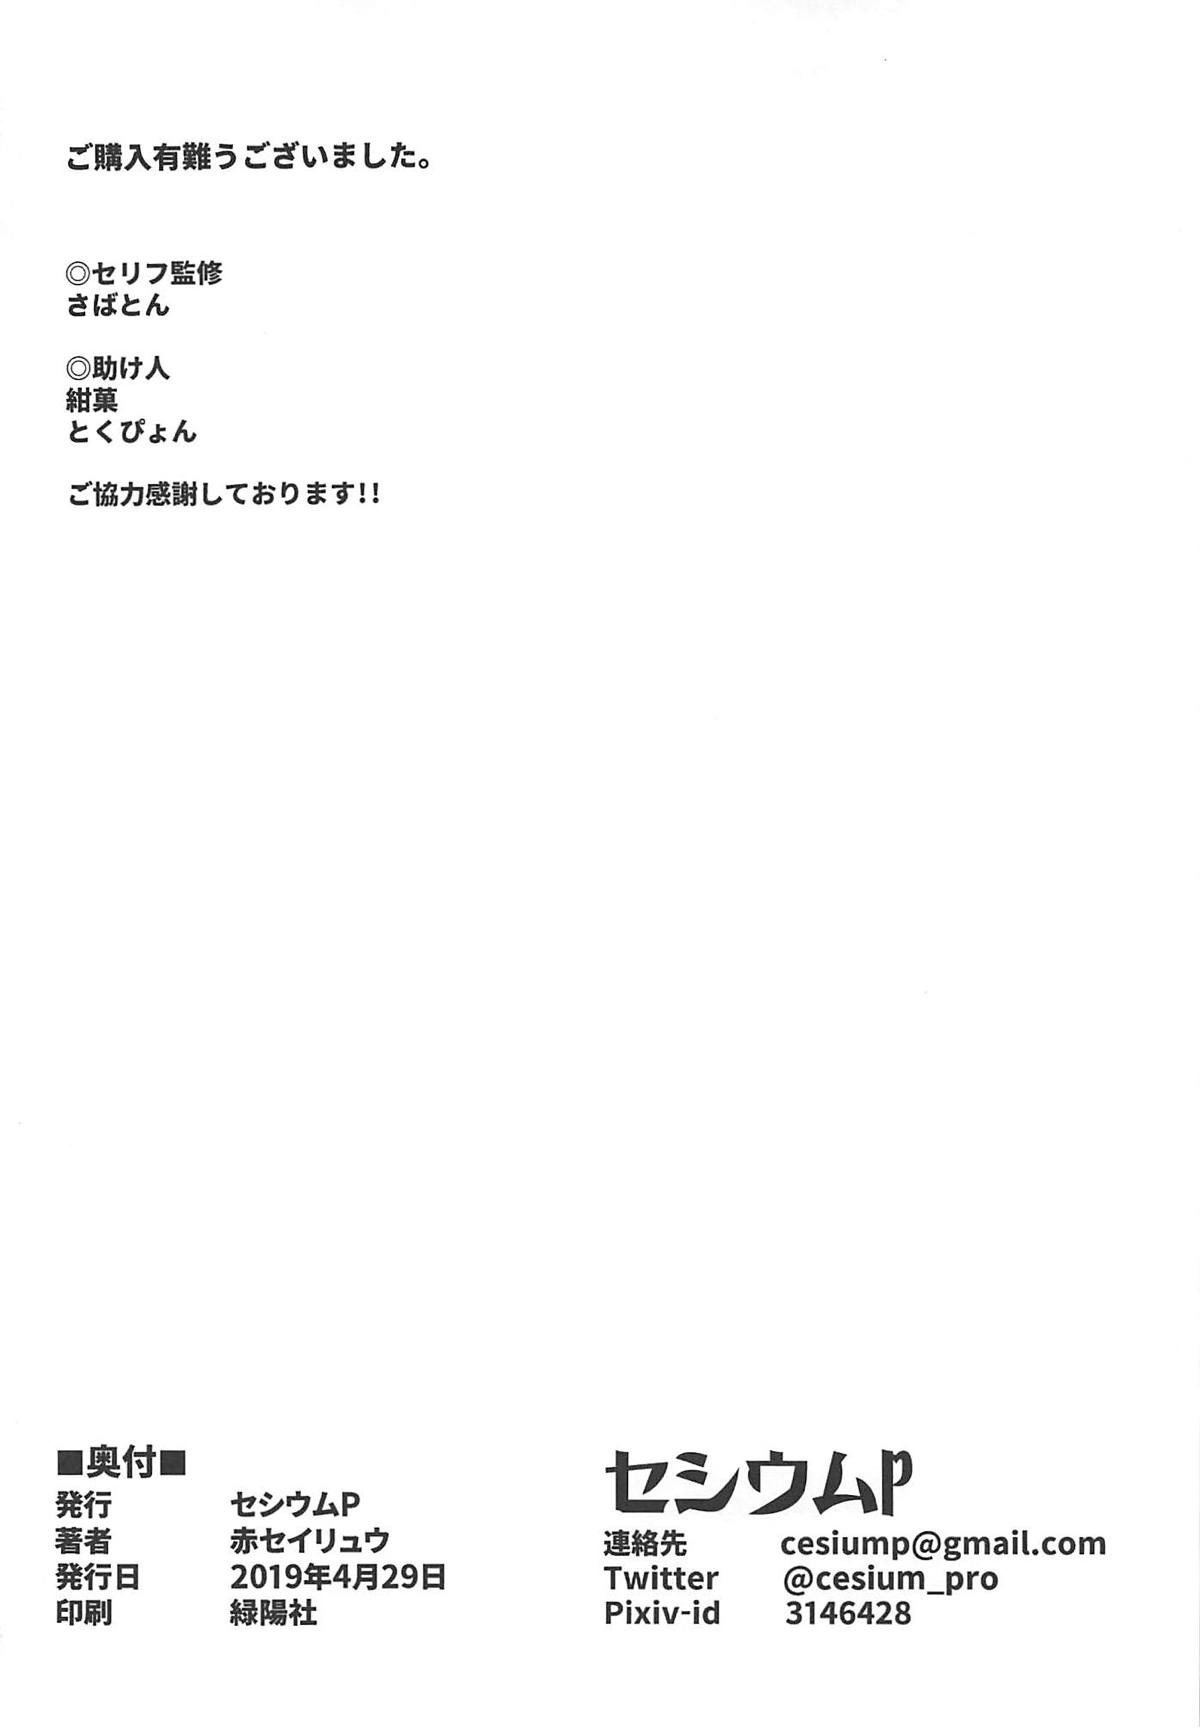 St. Gloriana No Himitsu No Ochakai Cesium P 25